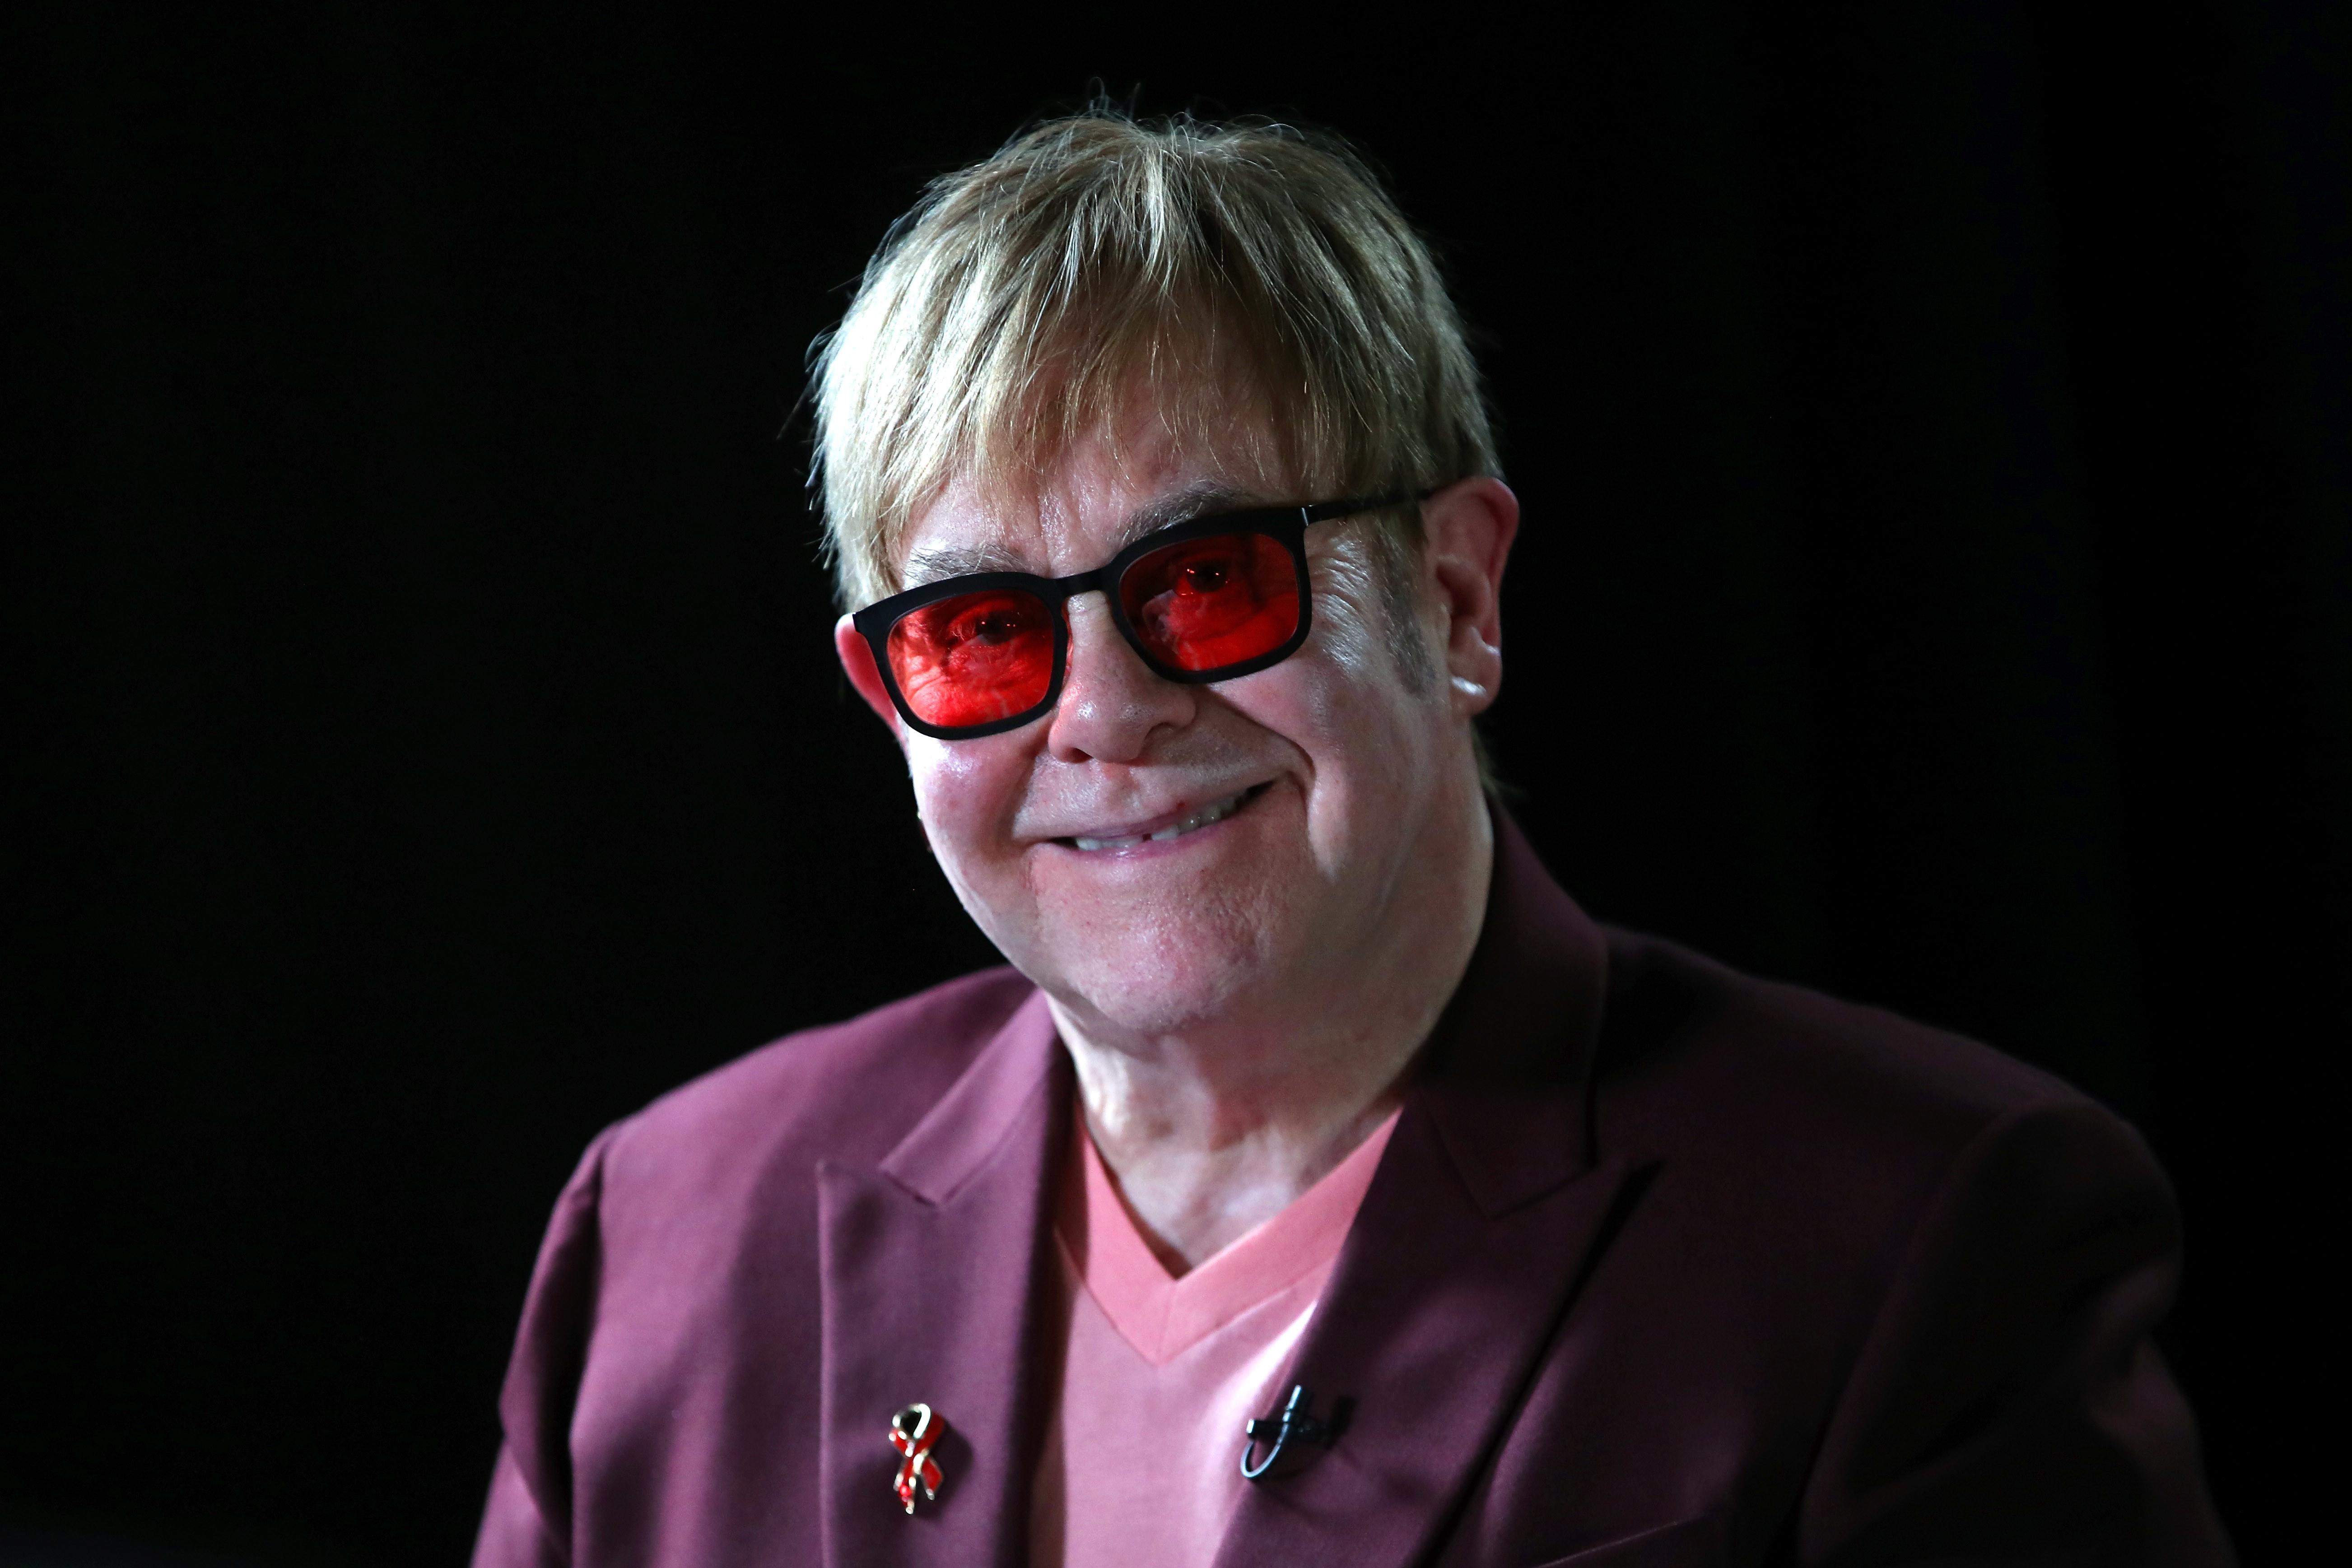 Filme sobre a vida de Elton John ganha trailer oficial